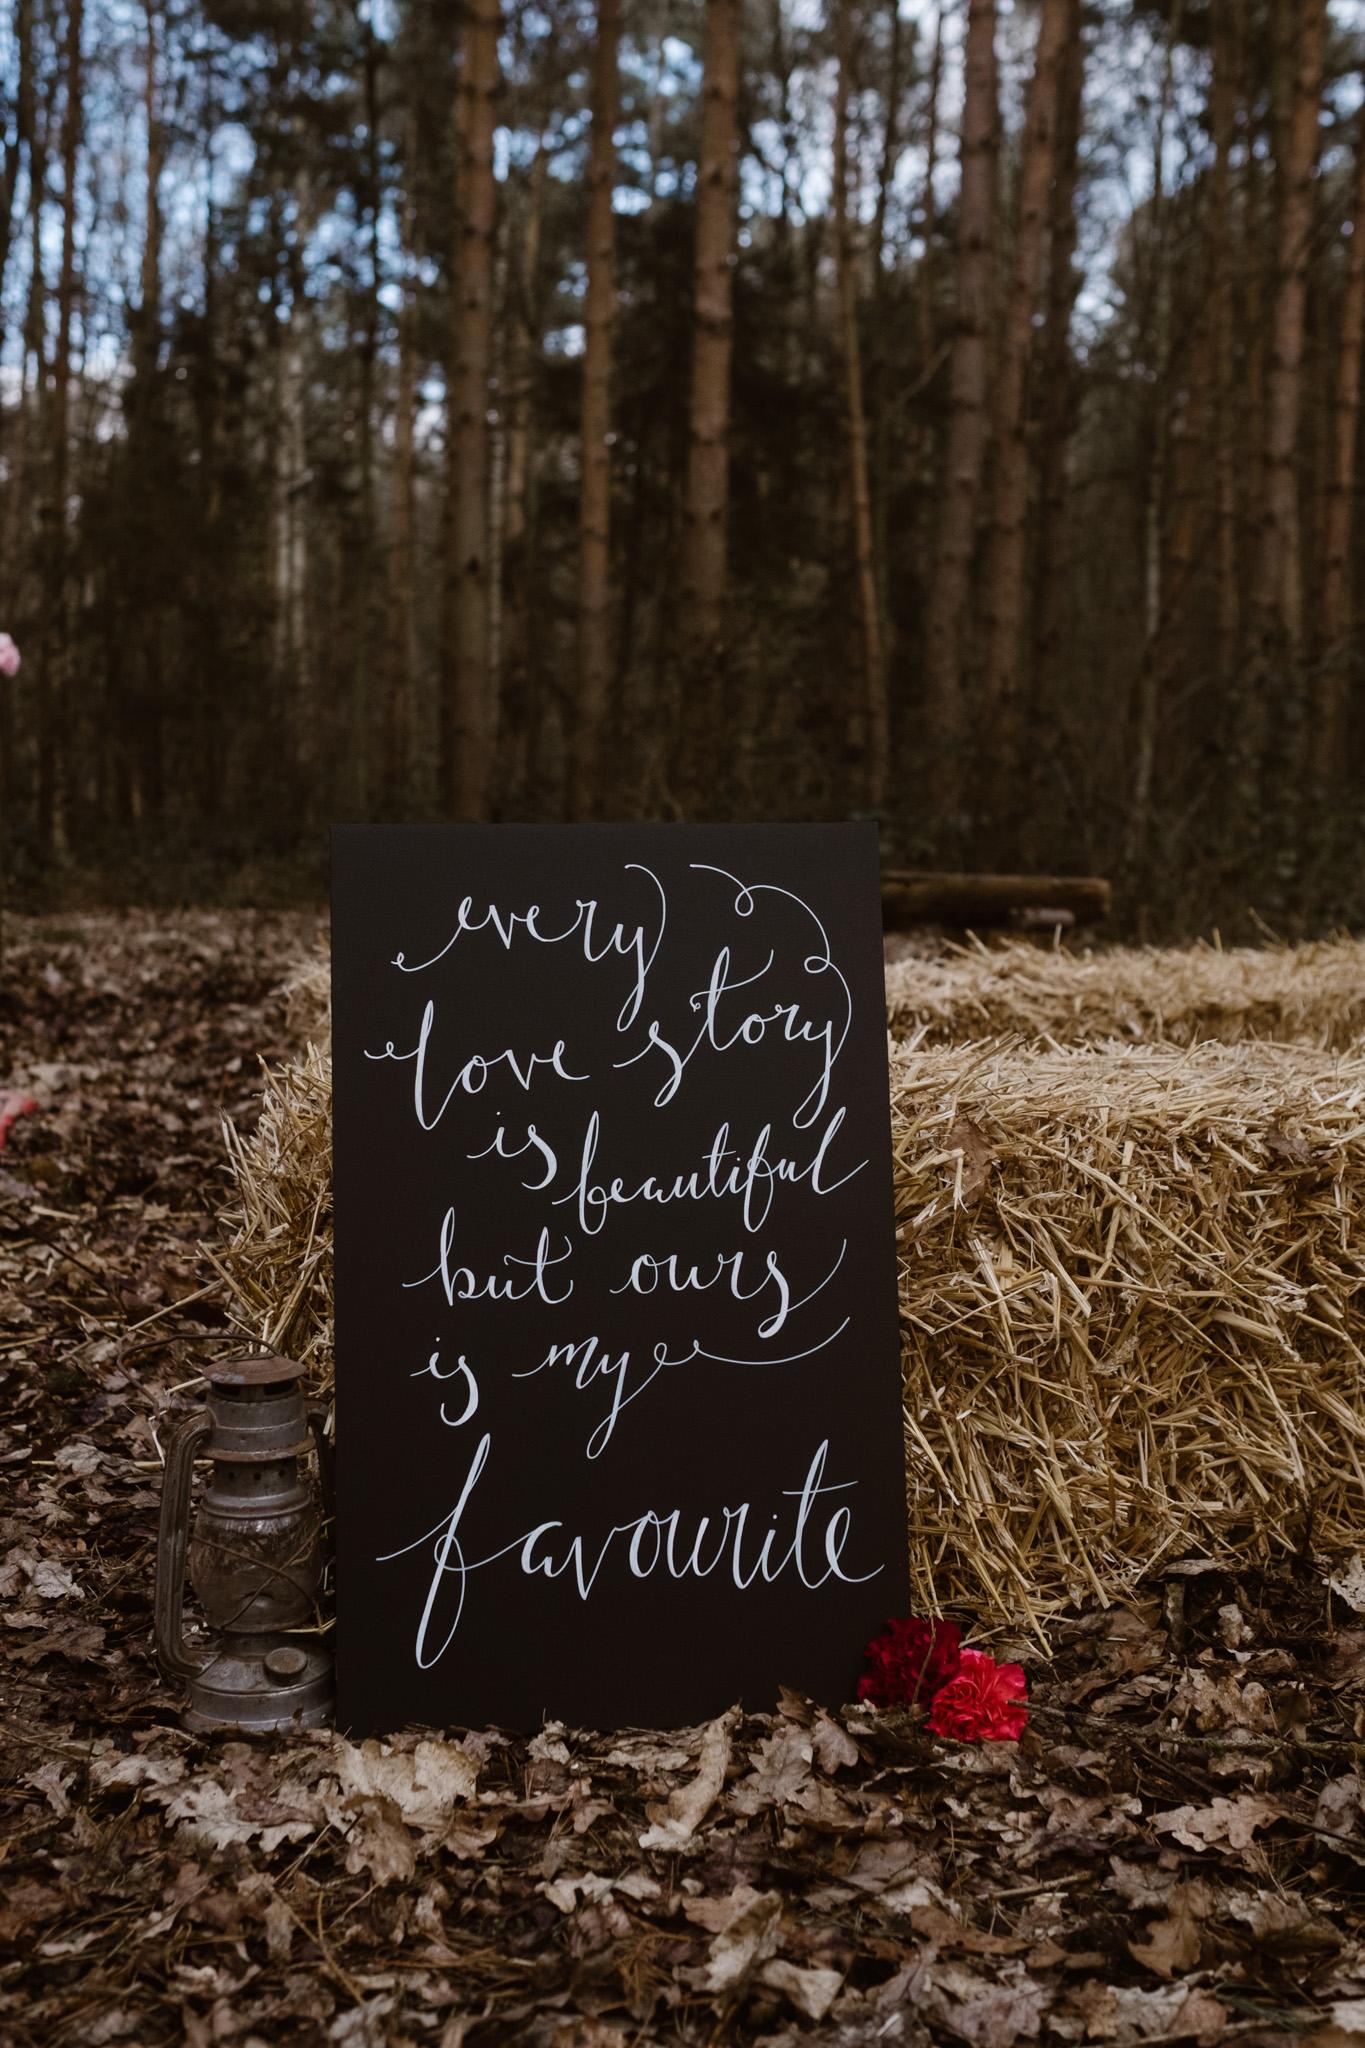 Captains-Wood-Barn-Alterative-Rustic-Vintage-Essex-Wedding-Suffolk-Grace-Elizabeth-40.jpg